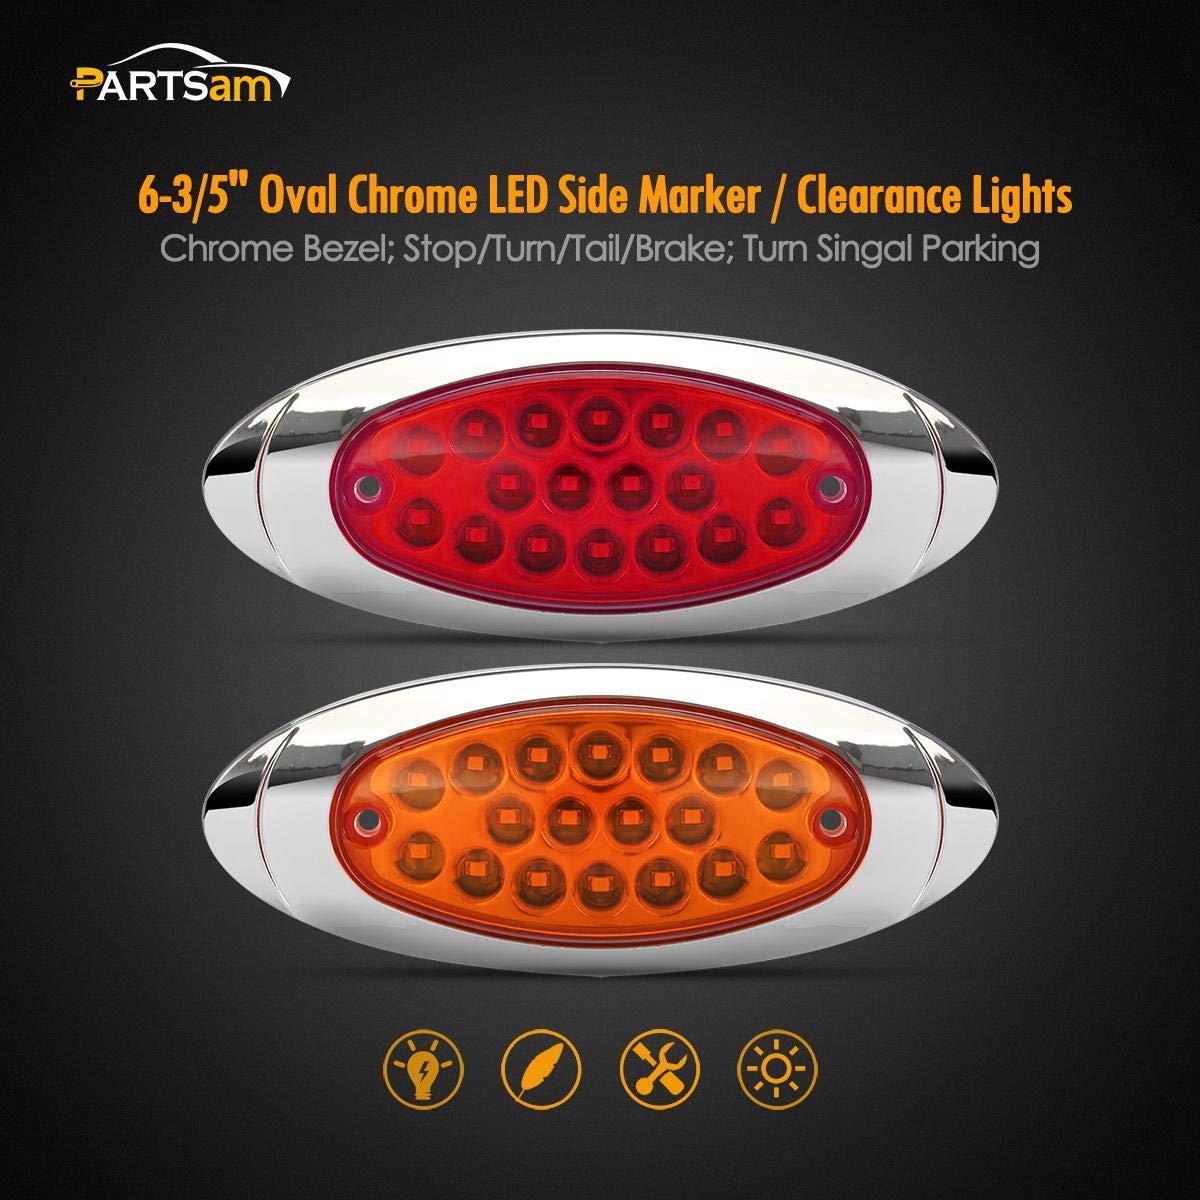 Oval led Trailer Marker Lights Partsam 4 Pcs 4-1//3 Red//Amber Led Oval Side Marker Lights with Chrome Bezel Trailer Parking and Turn Signal Lights Aux Stop Turn Tail Brake Lights